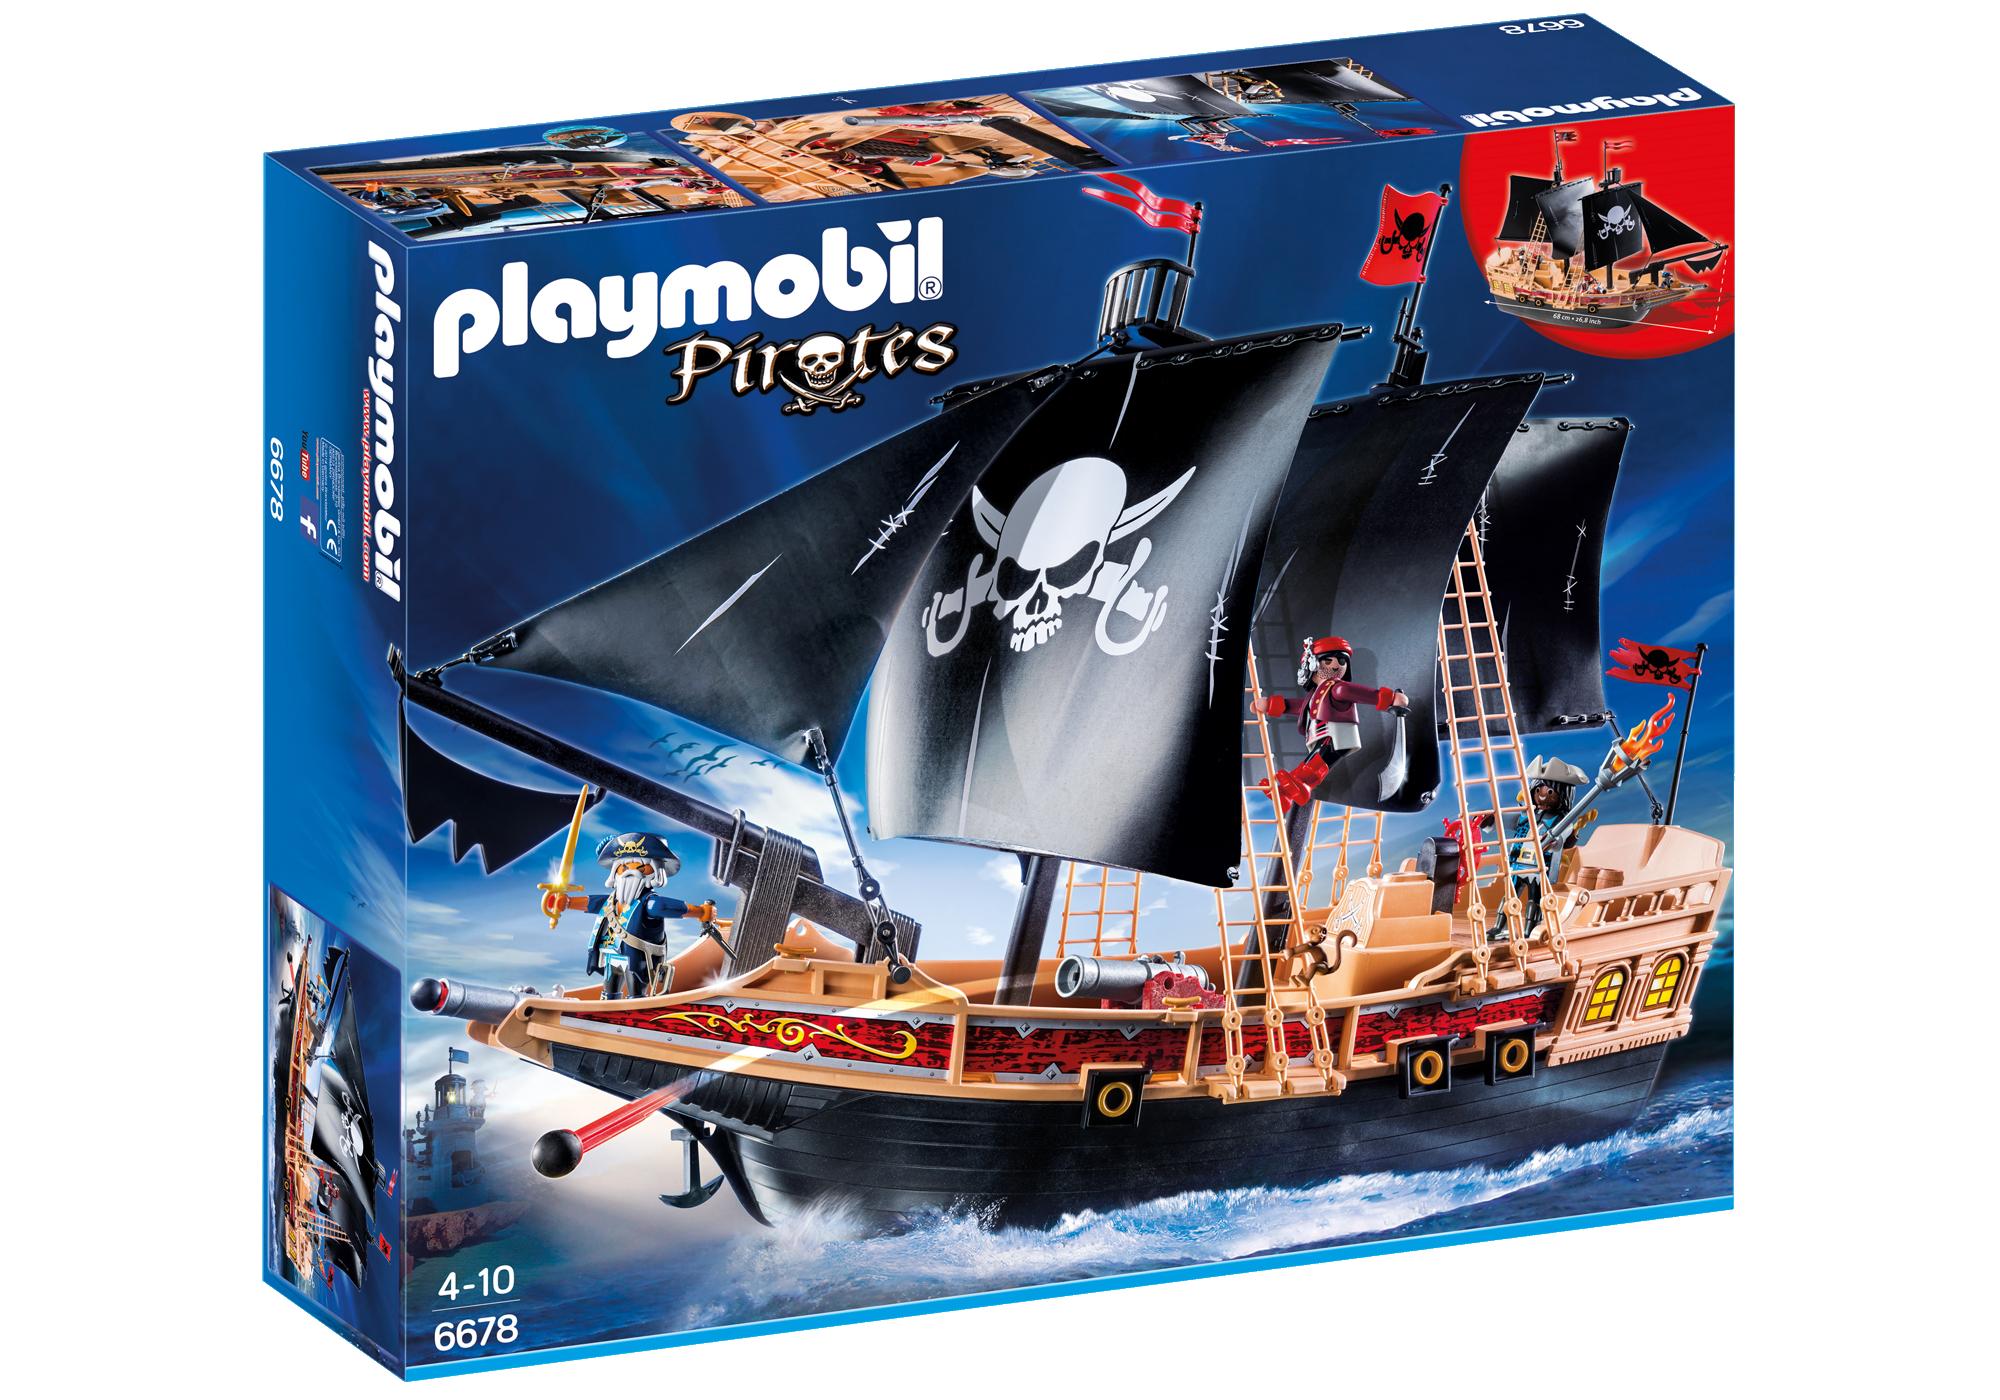 http://media.playmobil.com/i/playmobil/6678_product_box_front/Pirate Raiders' Ship